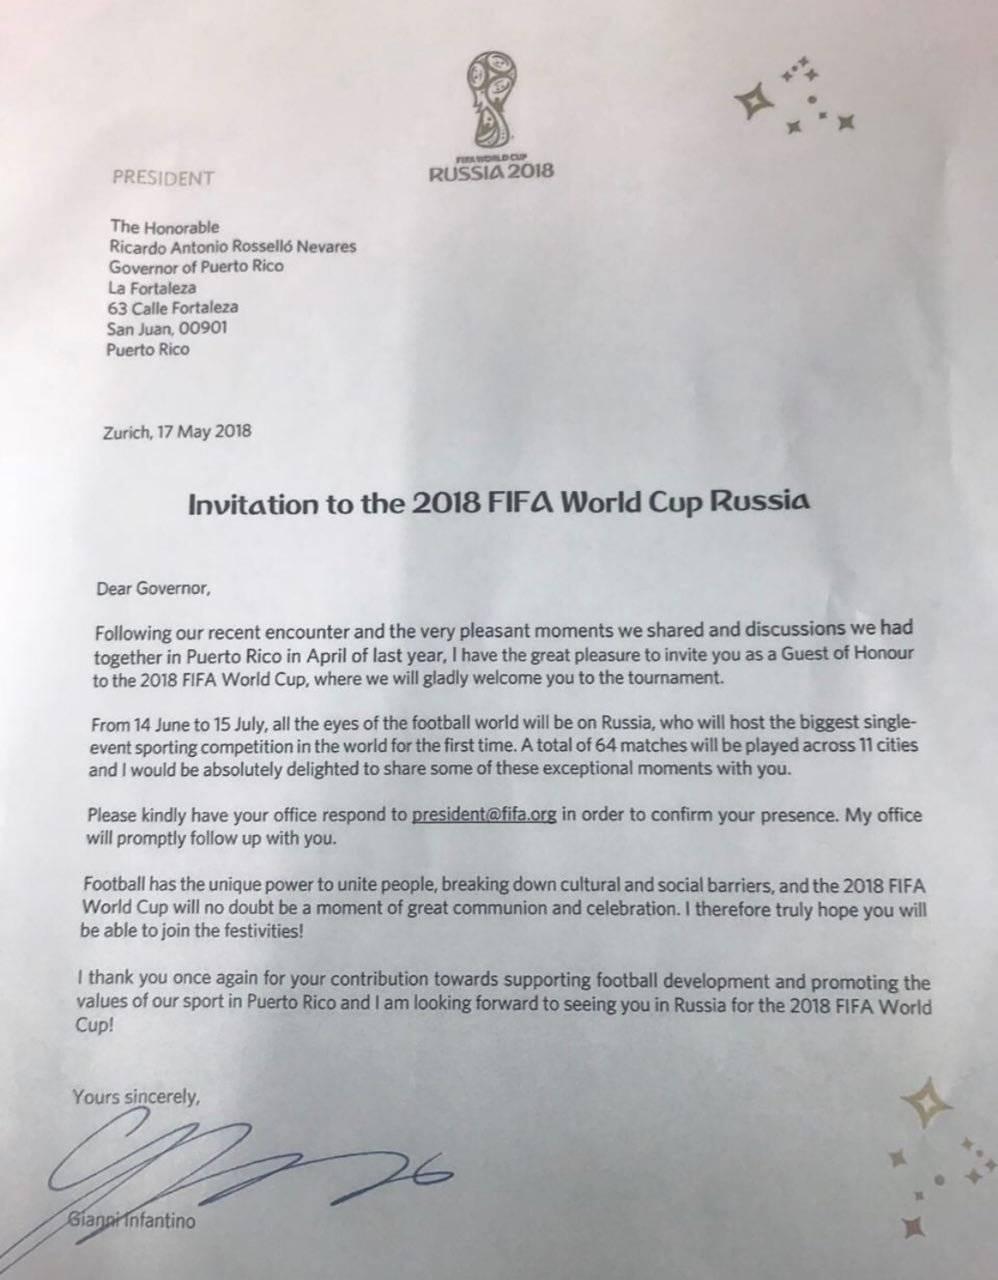 Carta de Fortaleza confirma participación de Ricardo Rosselló en la FIFA.